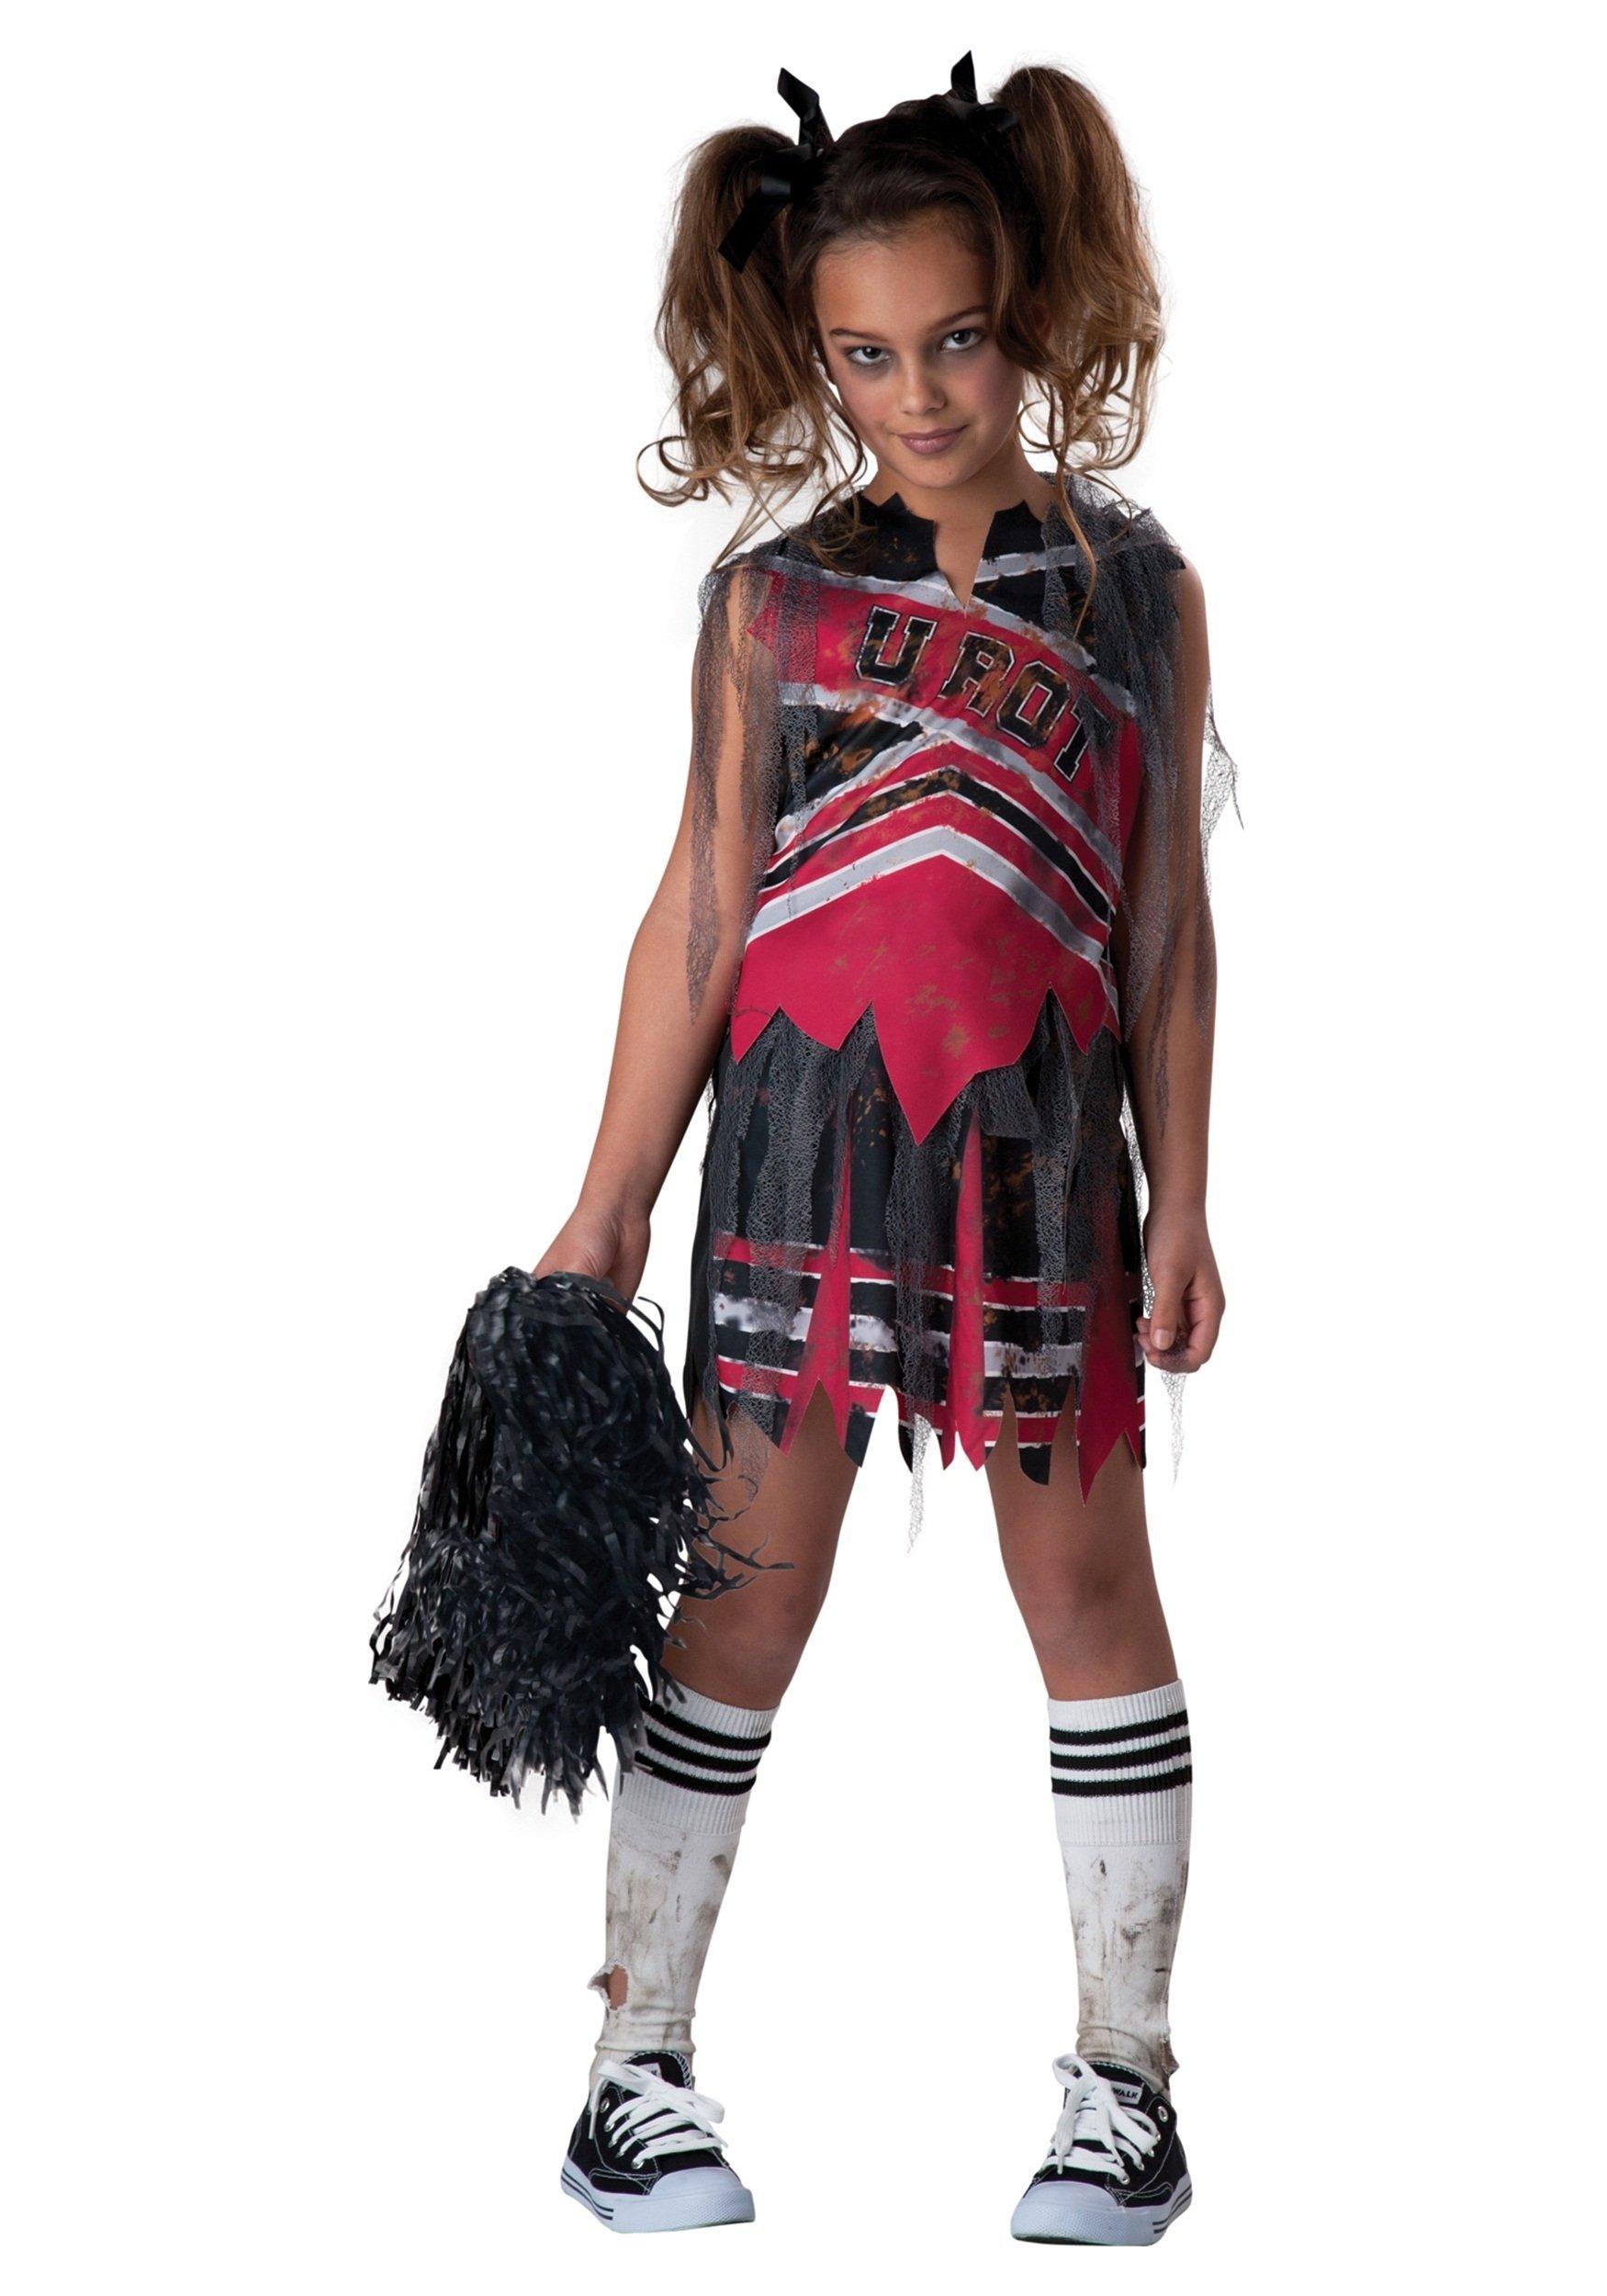 10 Attractive Zombie Costume Ideas For Kids spiritless cheerleader child costume 2021